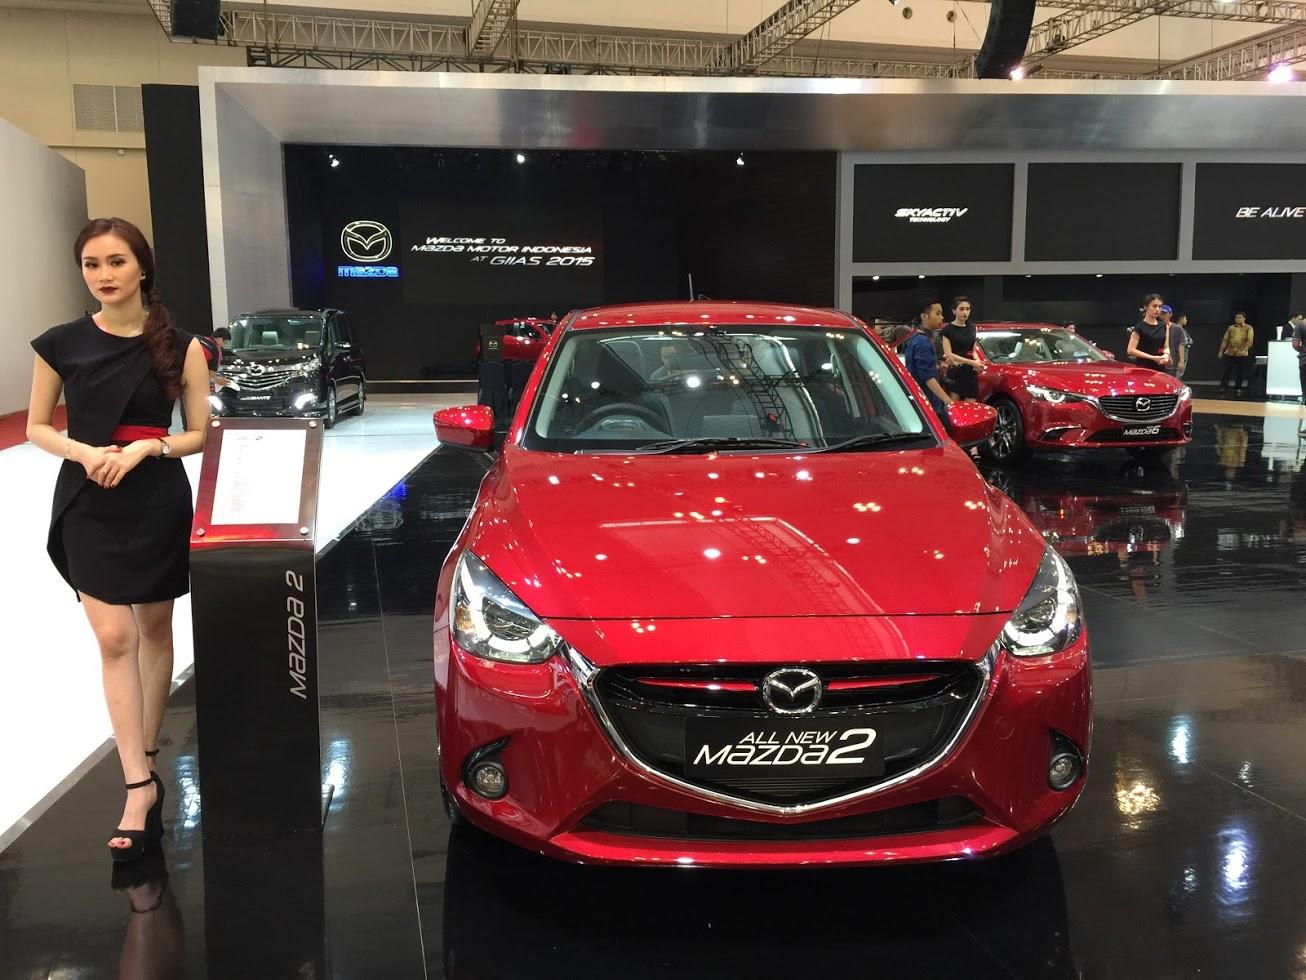 All New Mazda 2 FOTO: ROBERT ADHI KUSUMAPUTRA